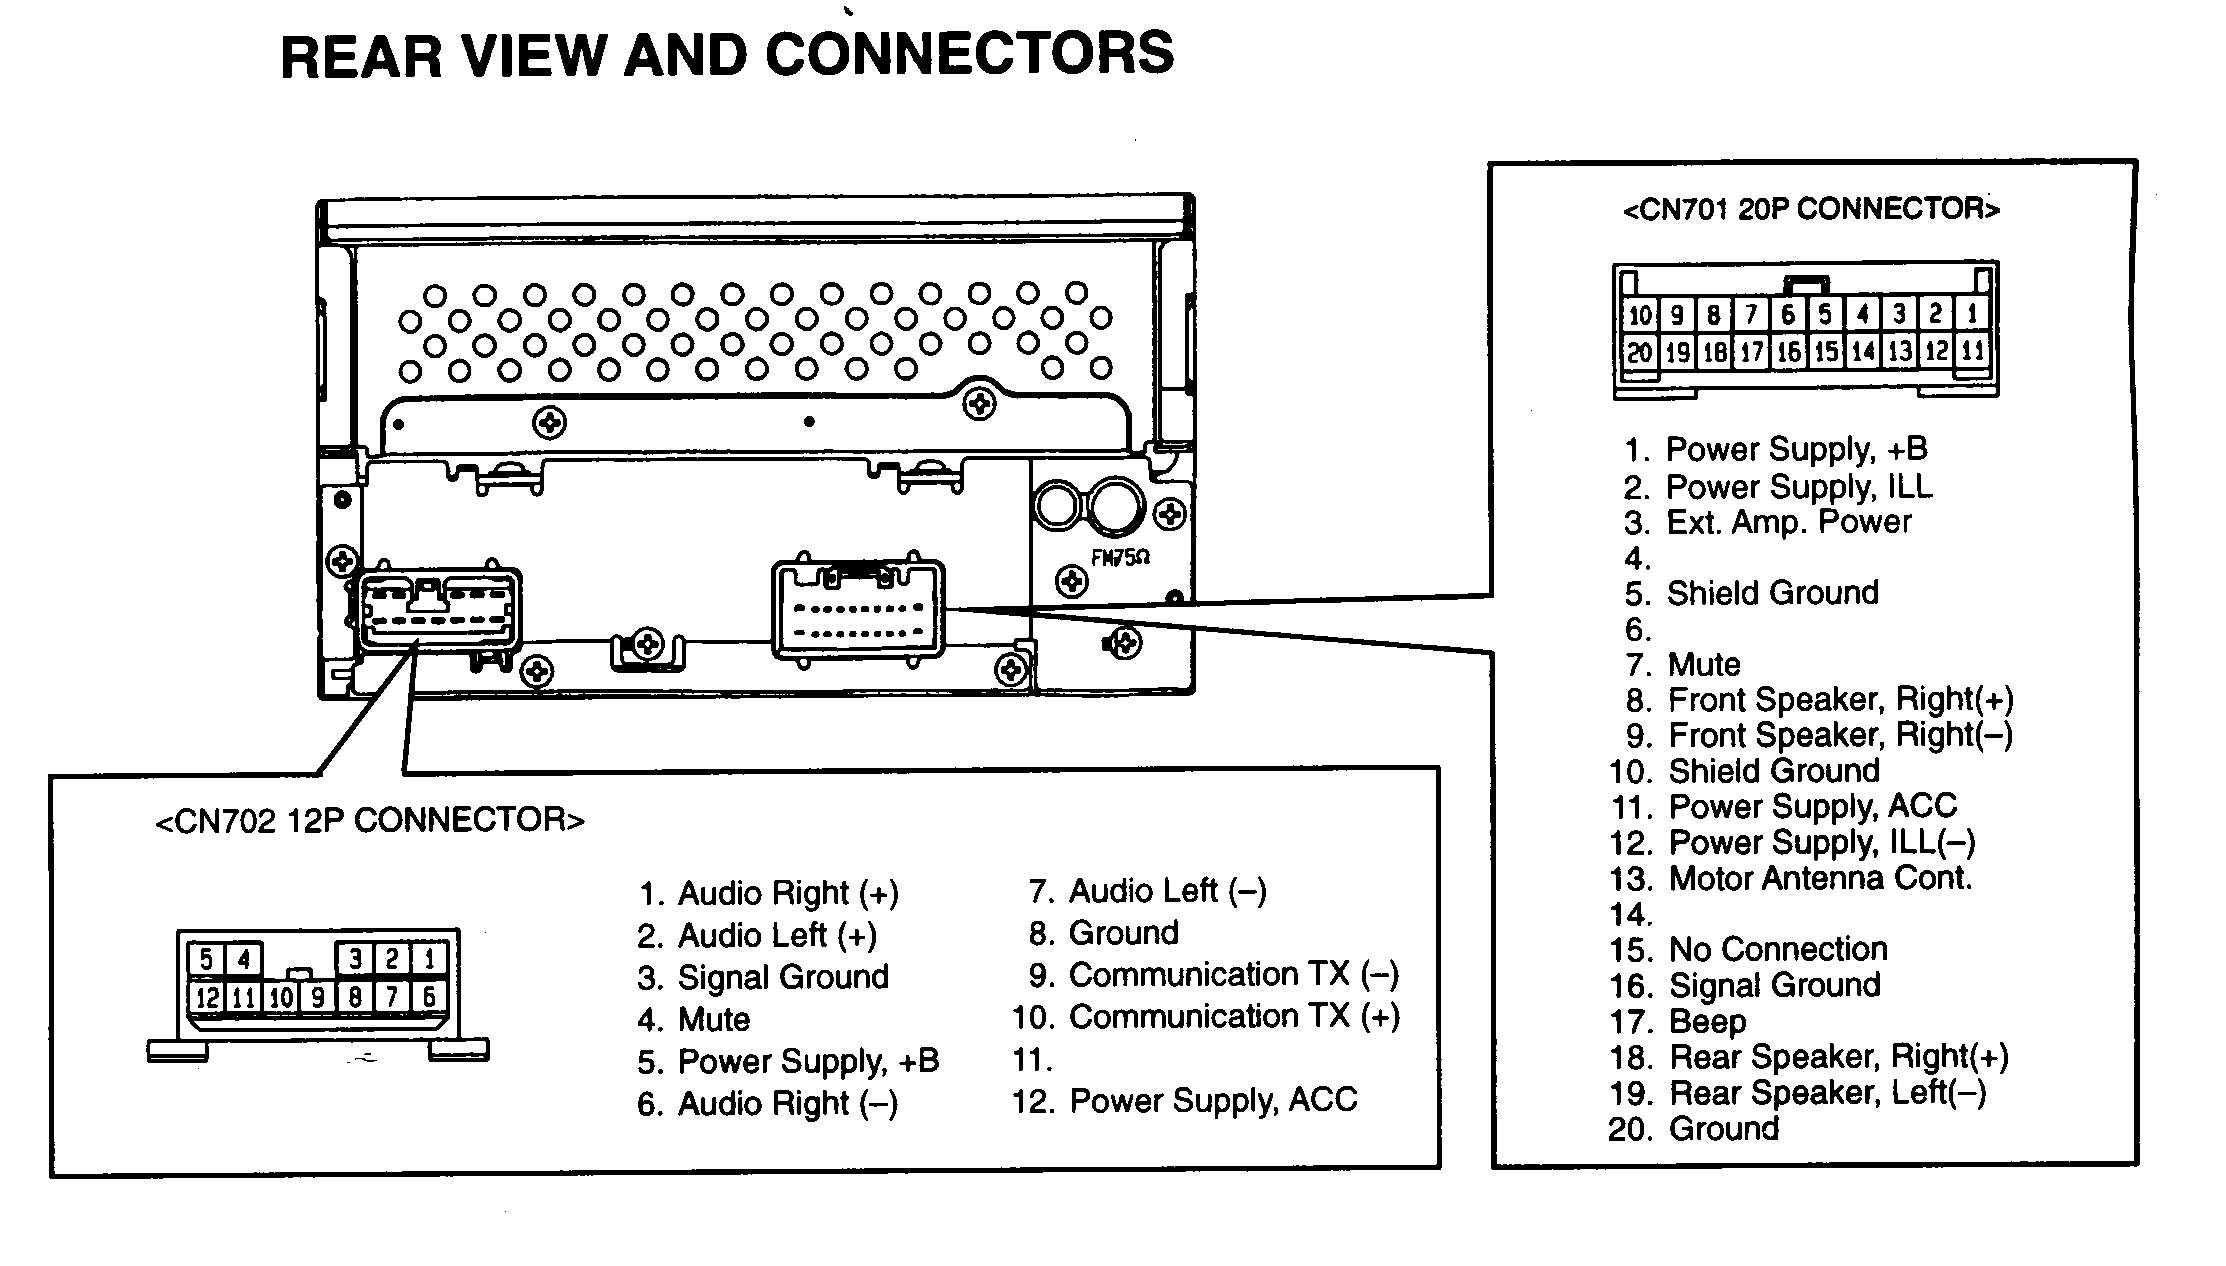 New Delco Amplifier Wiring Diagram Diagram Diagramtemplate Diagramsample Electrical Wiring Diagram Car Stereo Diagram